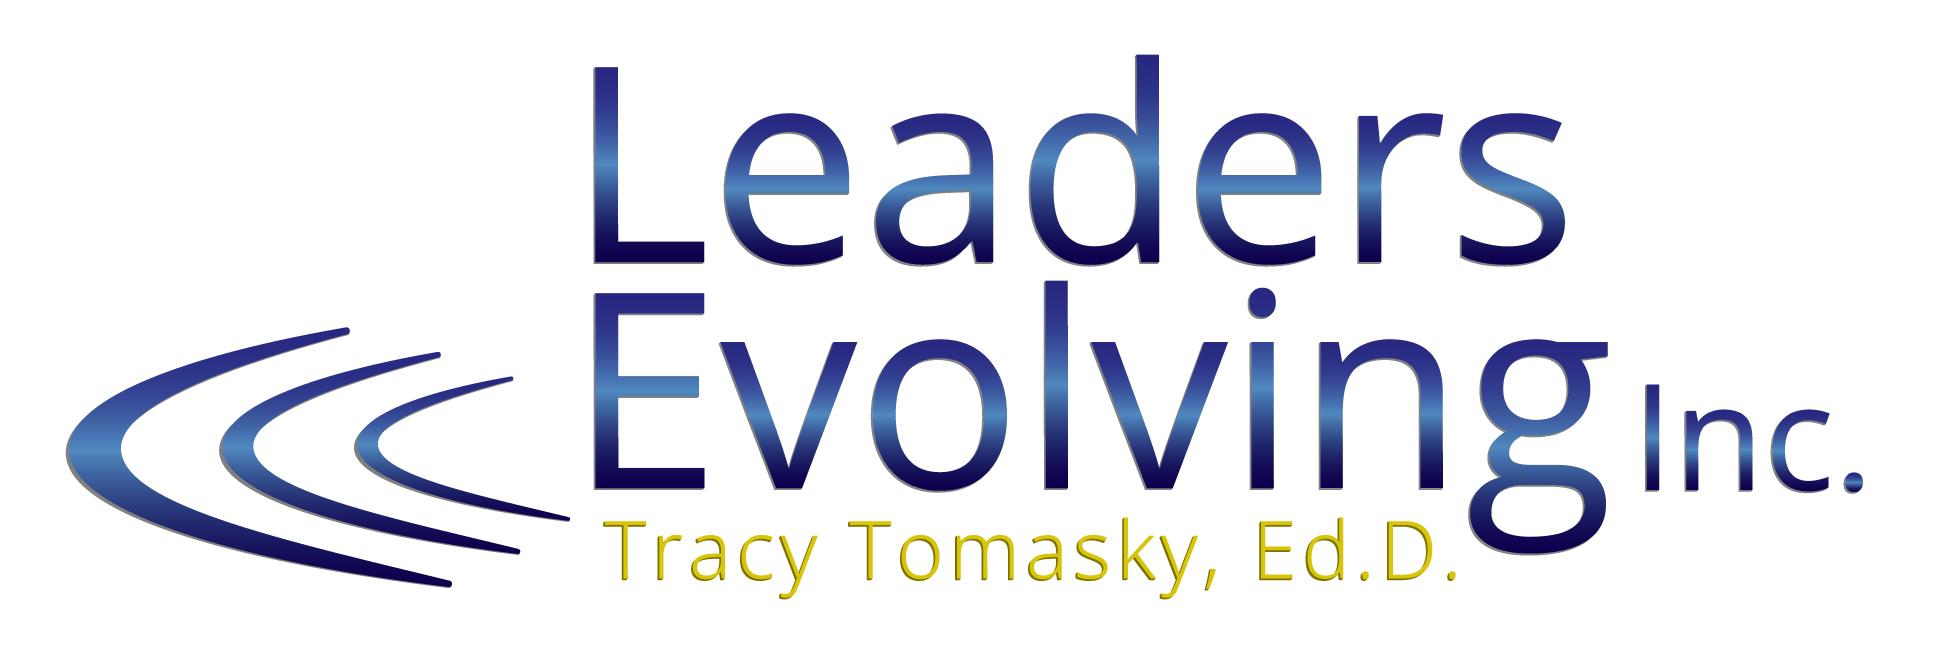 Leaders-Evolving-Inc-tracy-tomasky-2019-logo.jpg